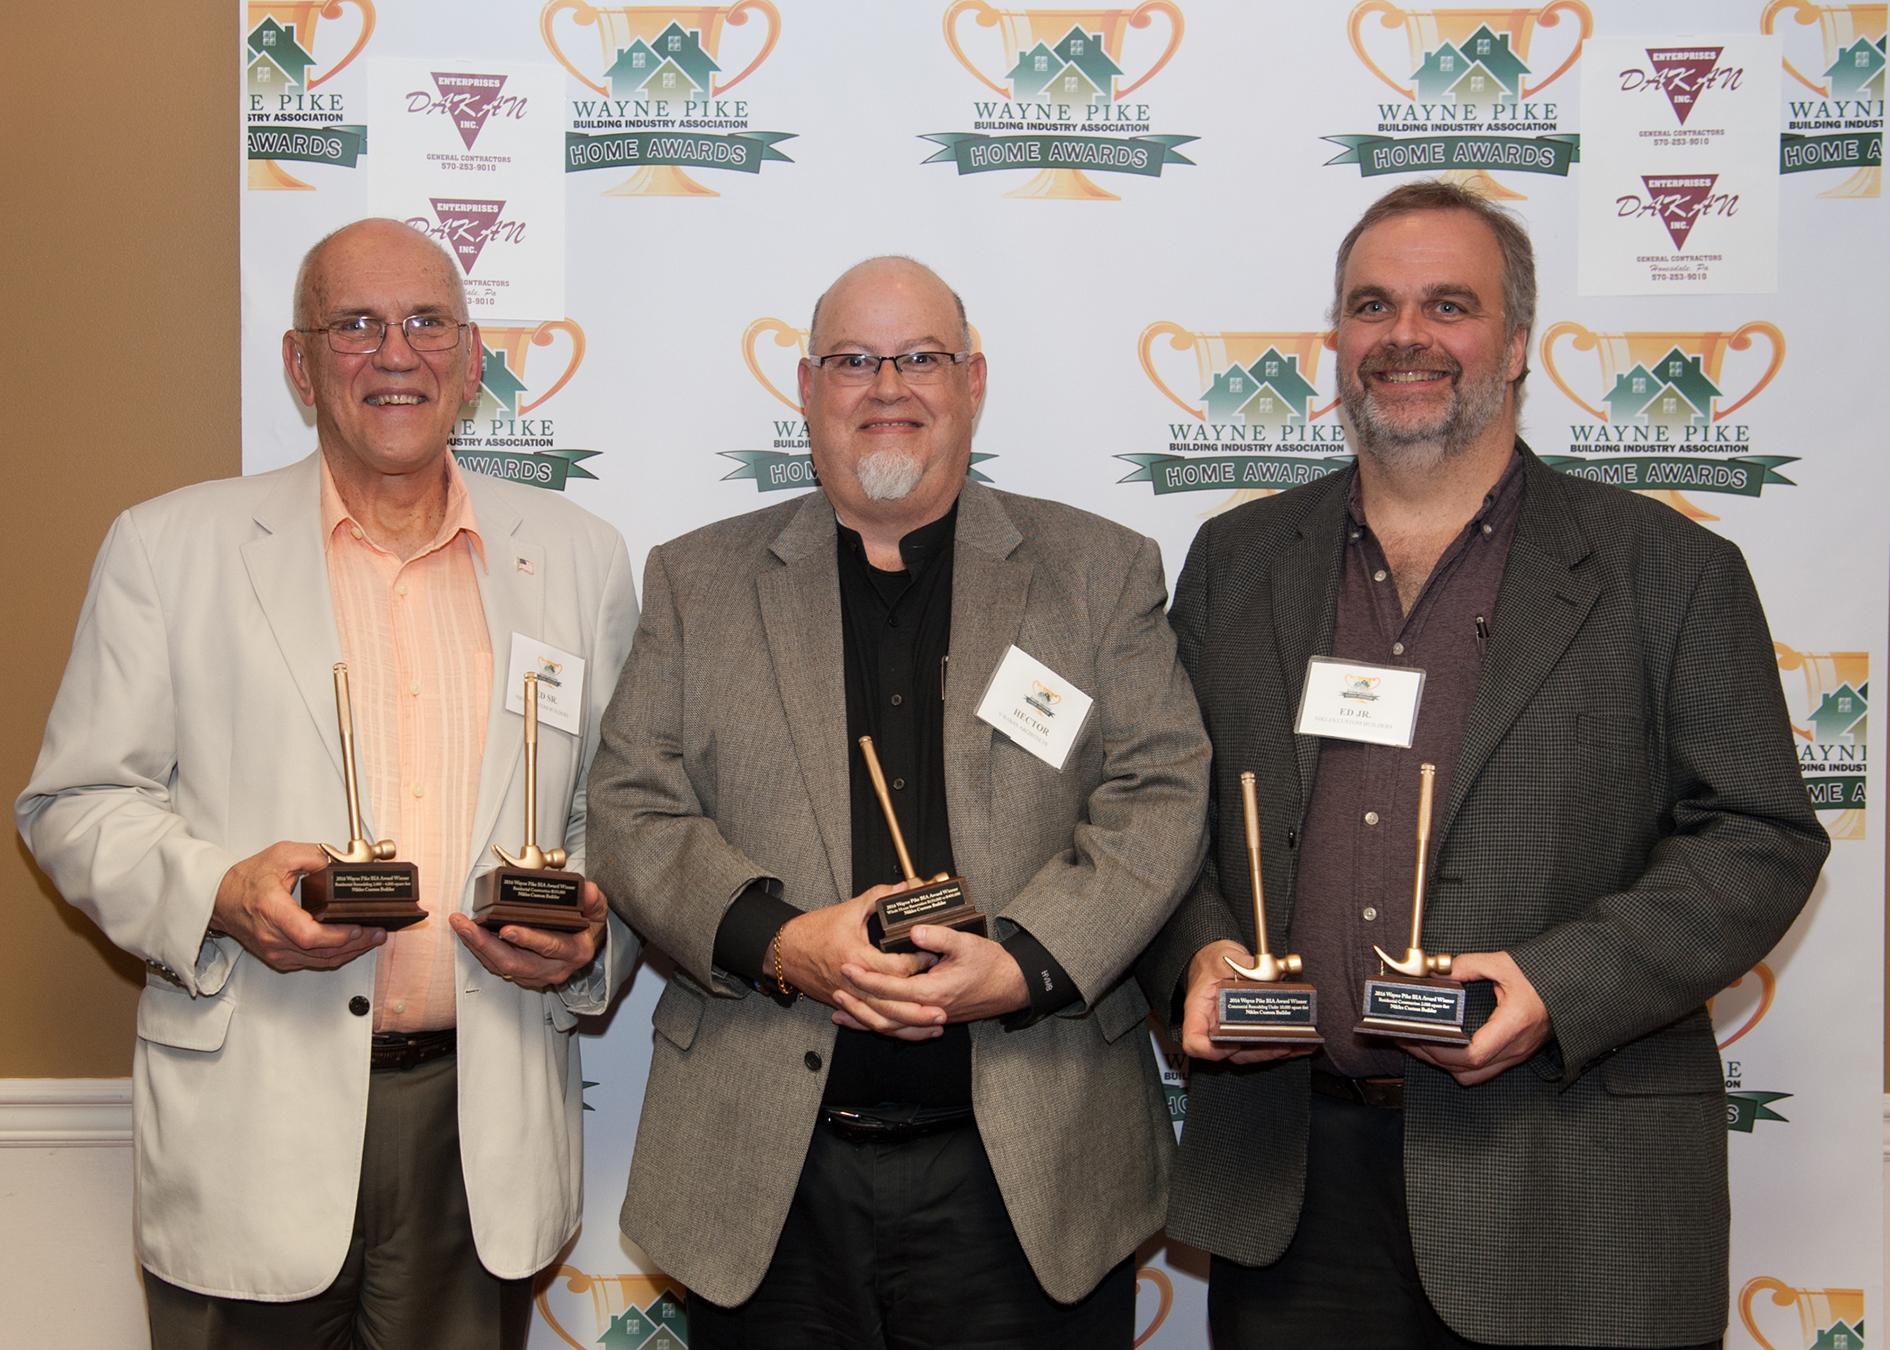 Pike County PA Builders Association Award Hector Munoz Baras Best Arch Design.jpg